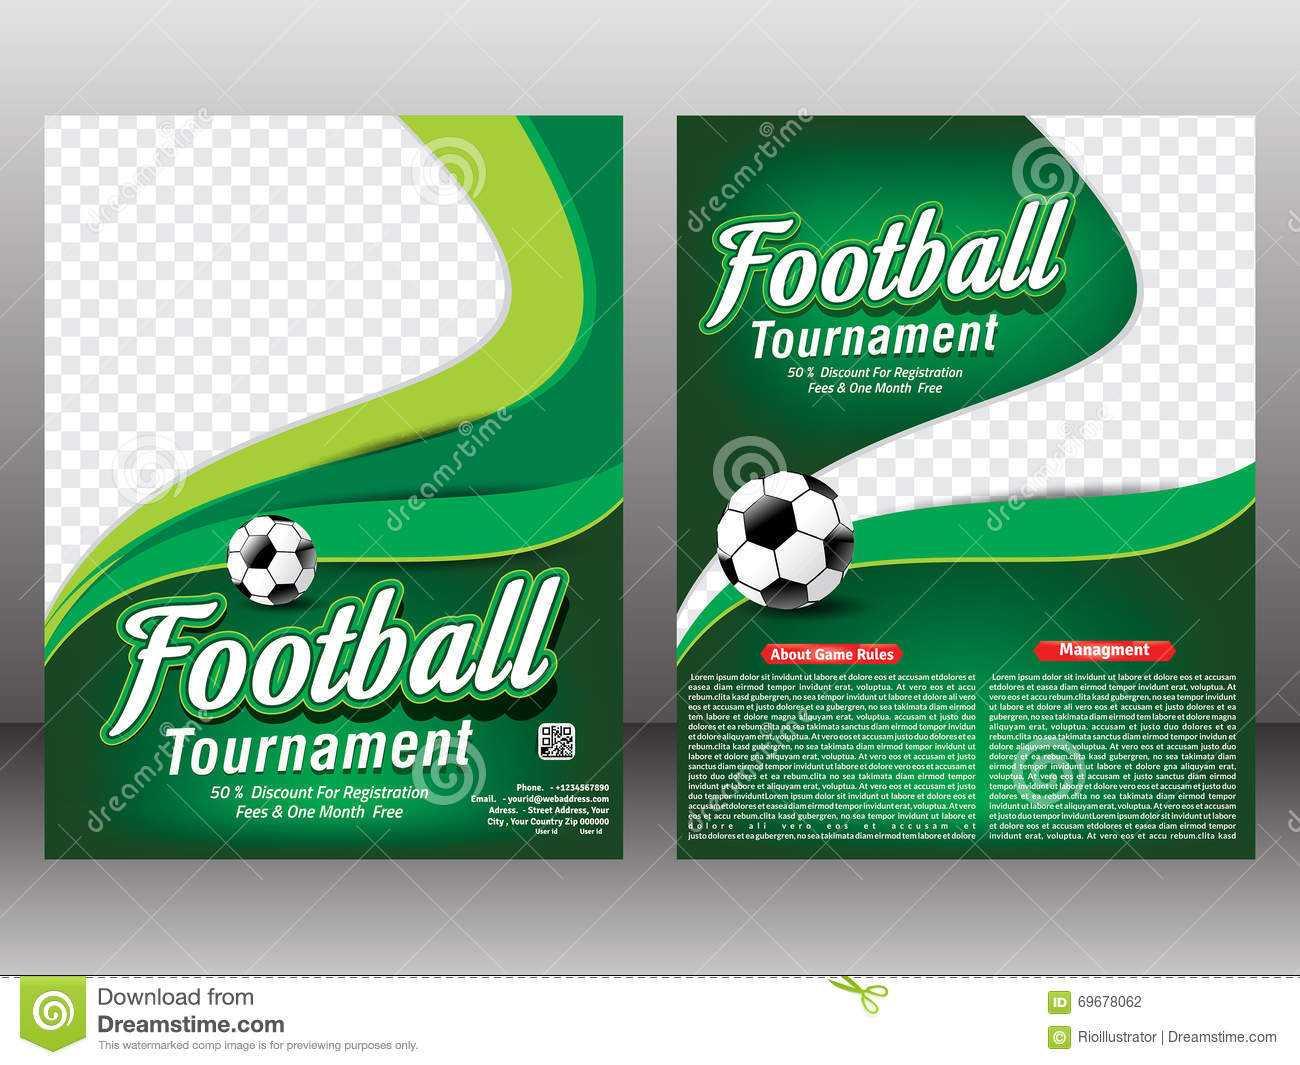 Football Tournament Flyer & Magazine Template Stock Intended For Football Tournament Flyer Template